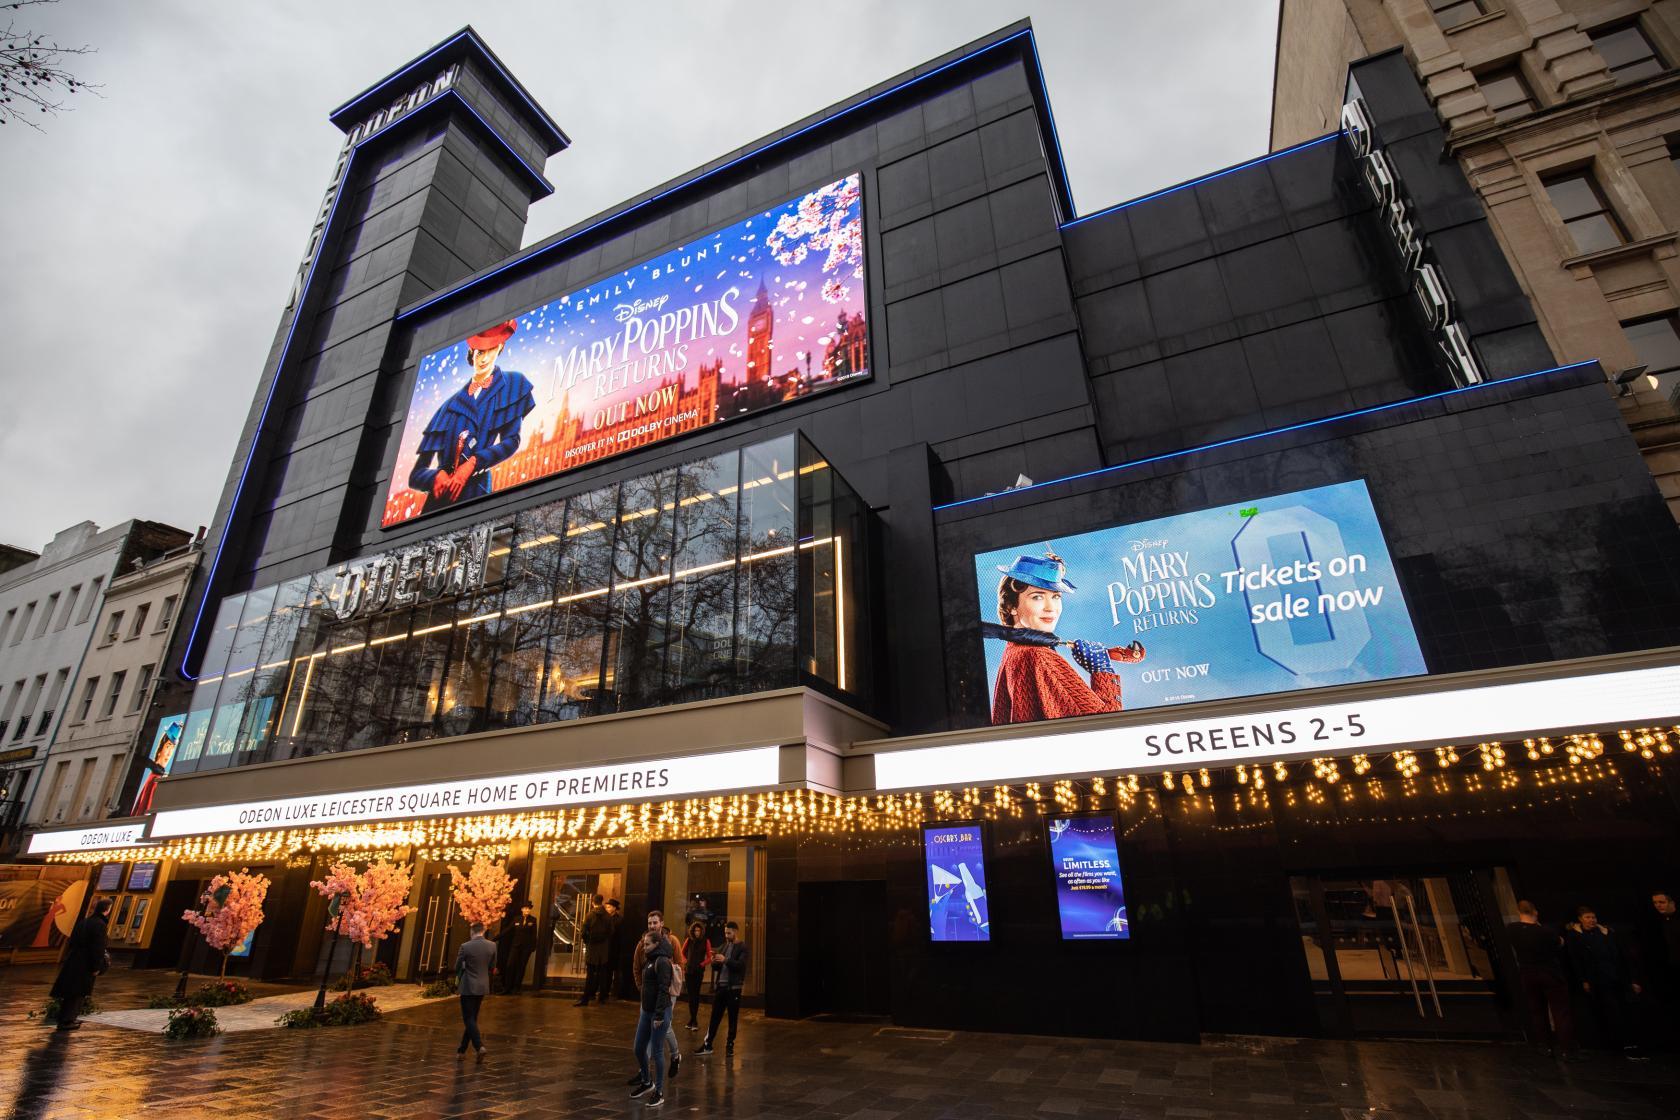 Odeon Luxe Leicester Square Event Venue Hire London Tagvenue Com